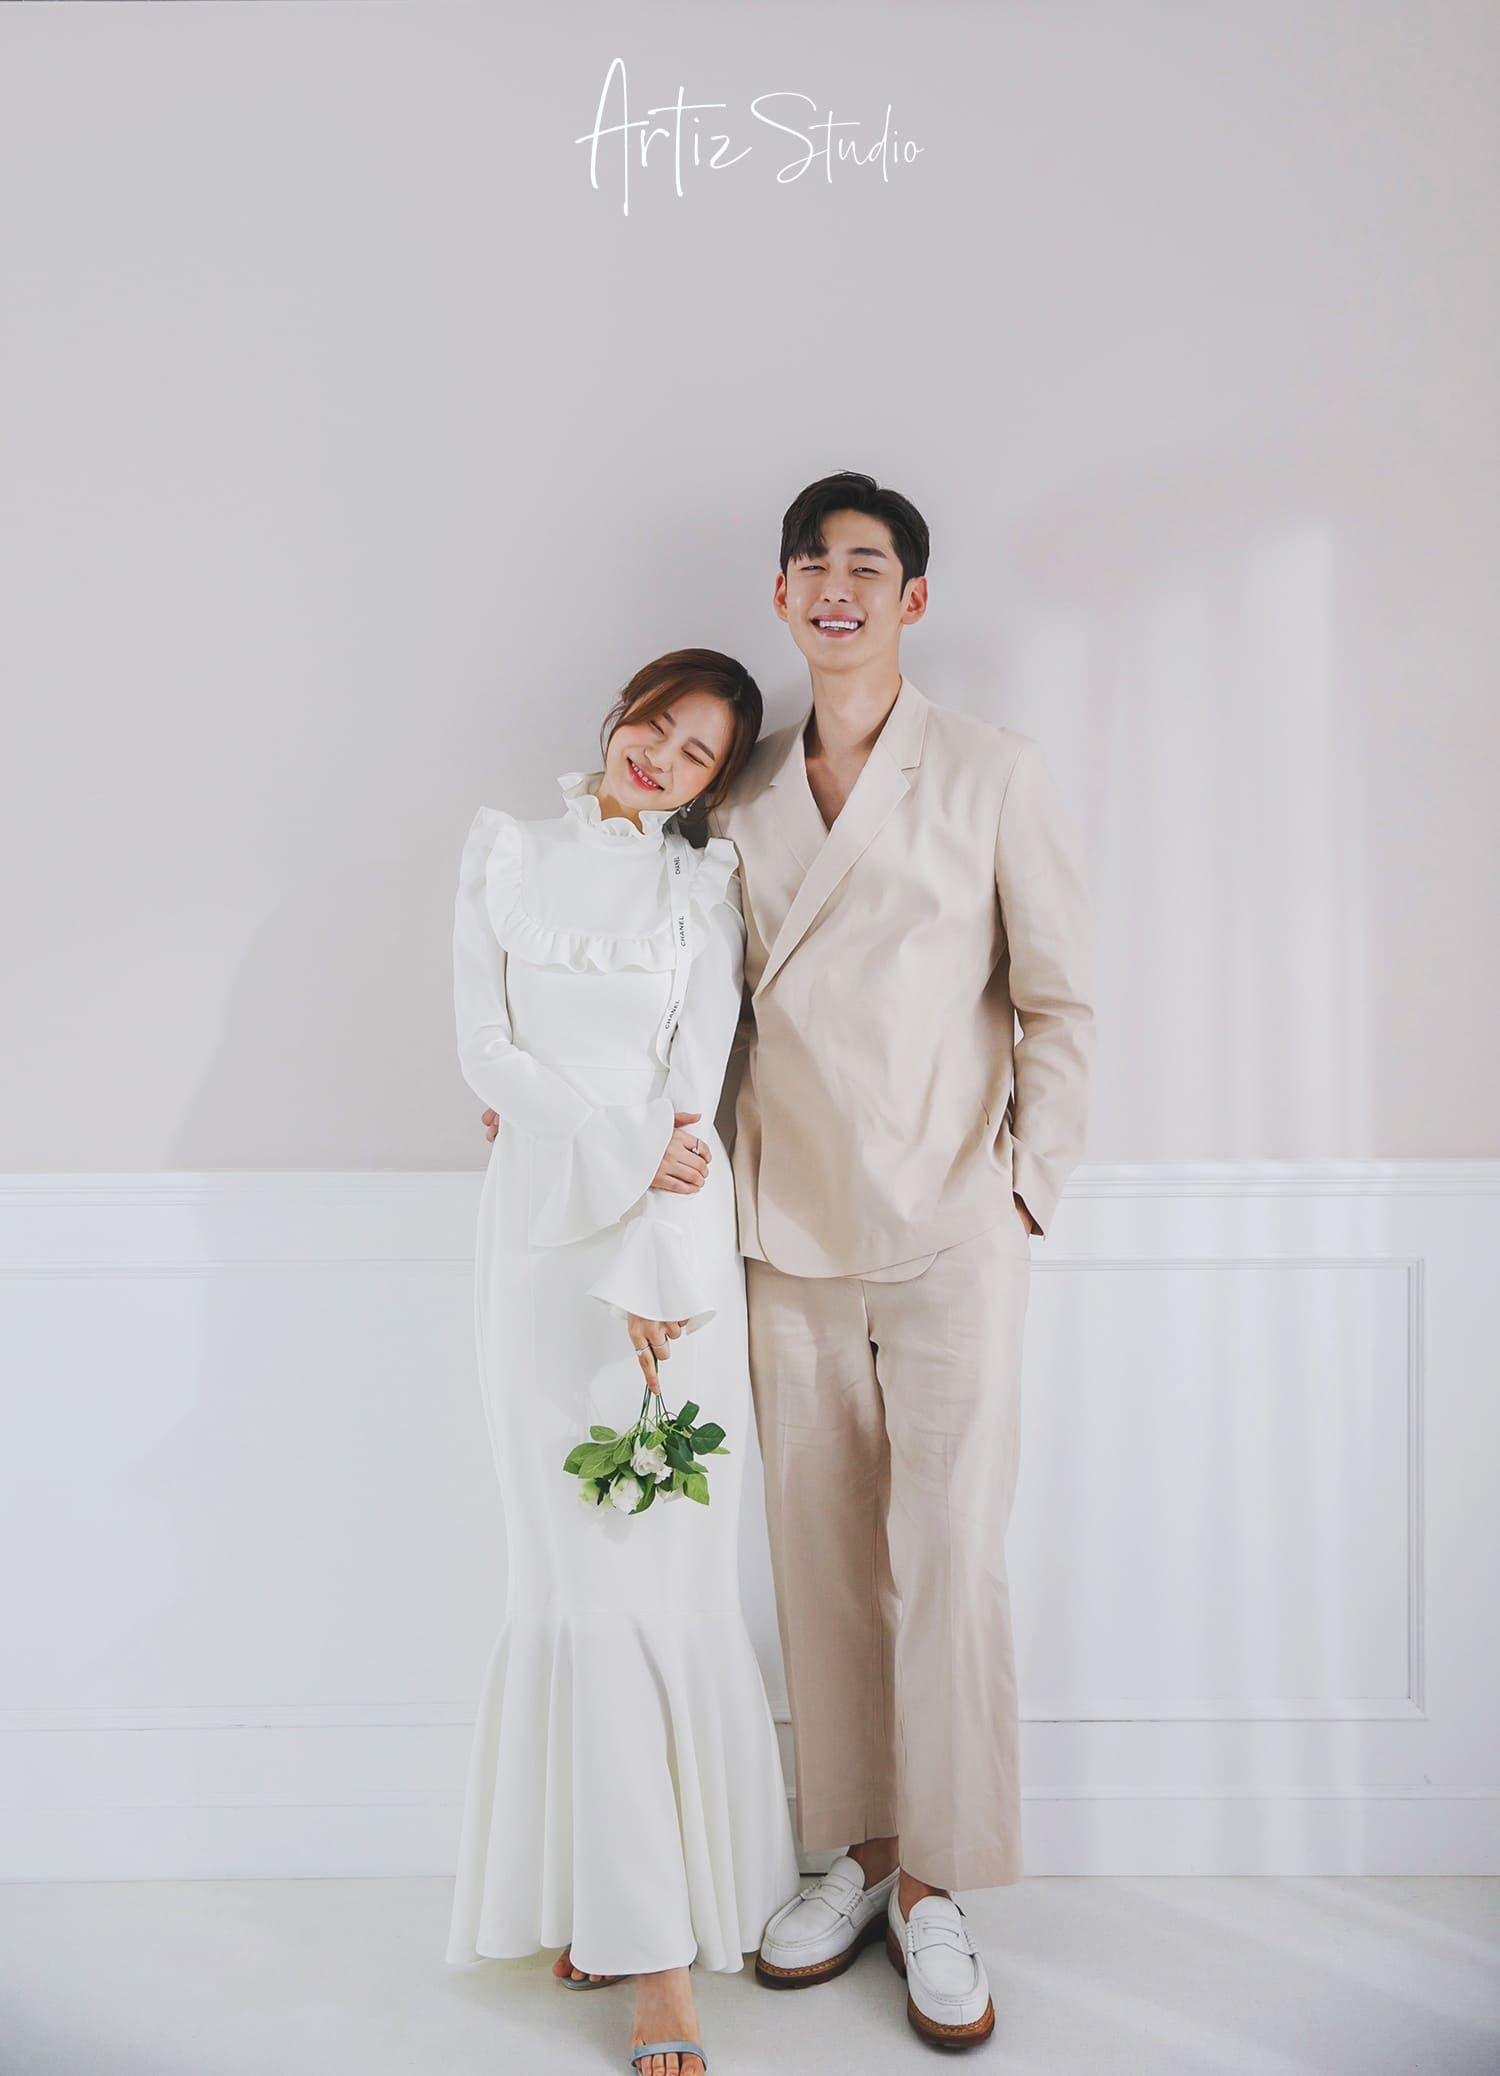 Singapore Bridal Wedding Shoot Korean Concept Big Day Artiz Studio In 2021 Wedding Photography Styles Wedding Photography Branding Pre Wedding Photoshoot [ 2076 x 1500 Pixel ]